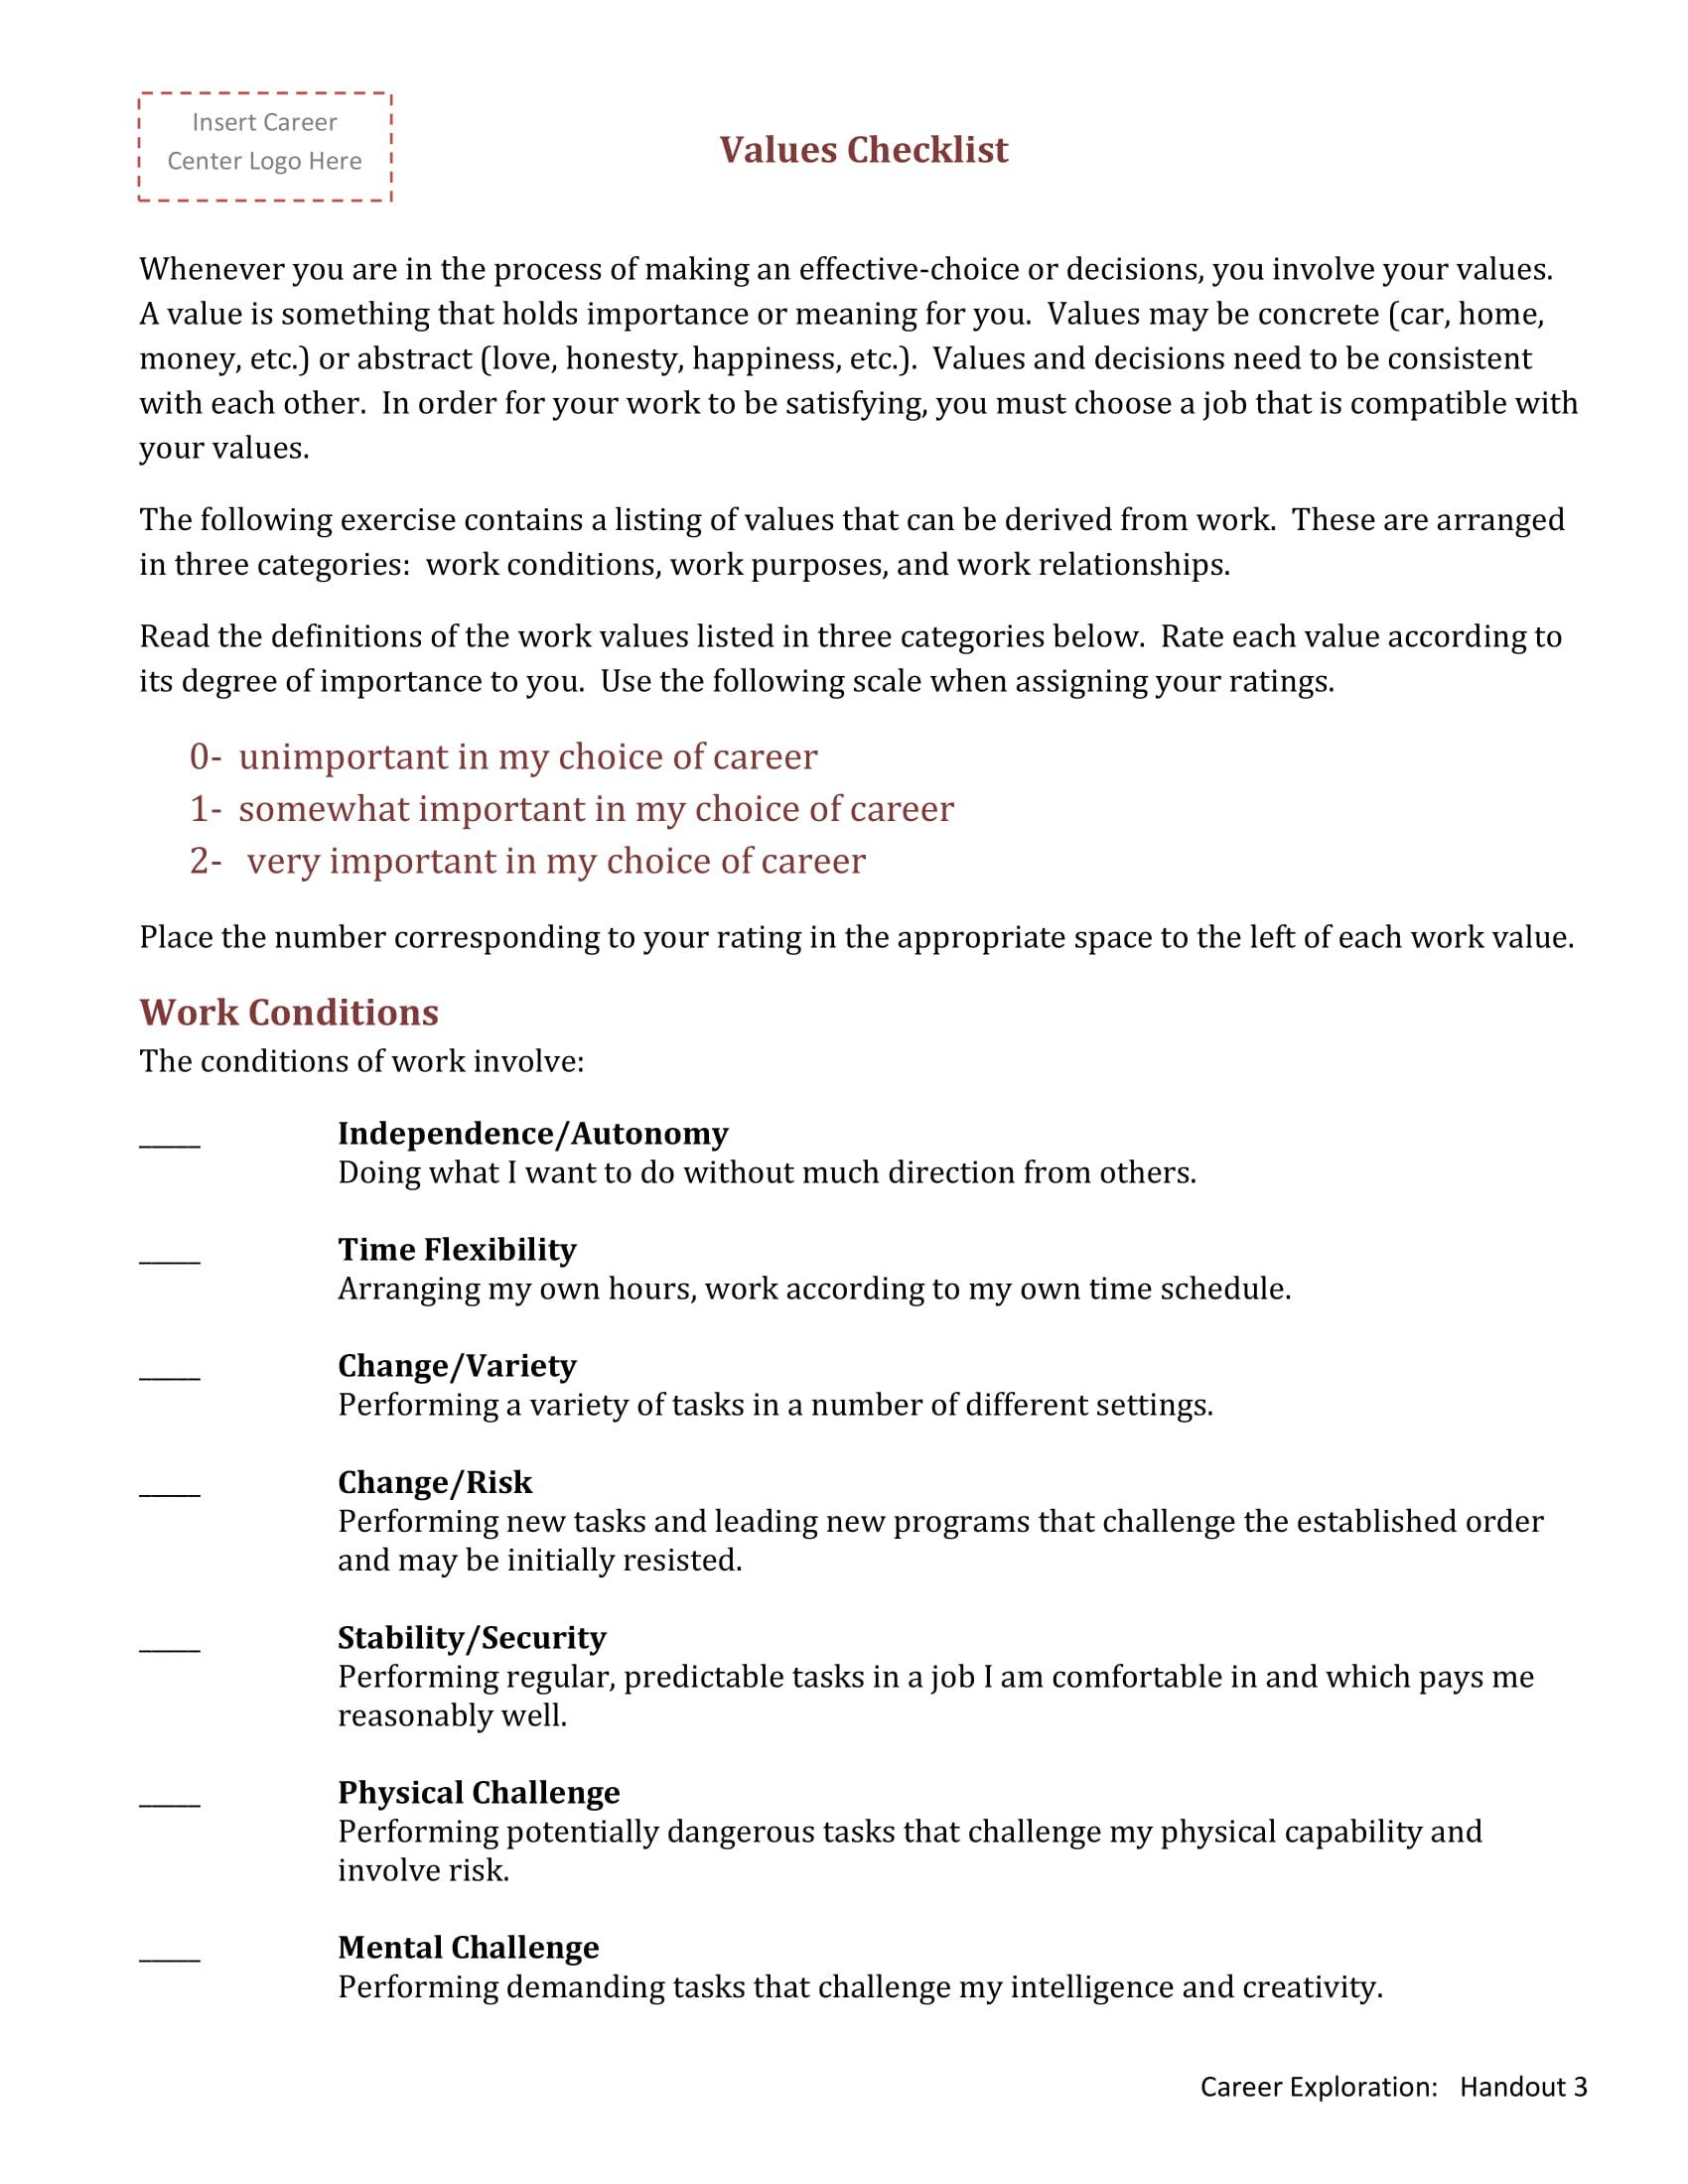 Form Work Values Checklist Template PDF